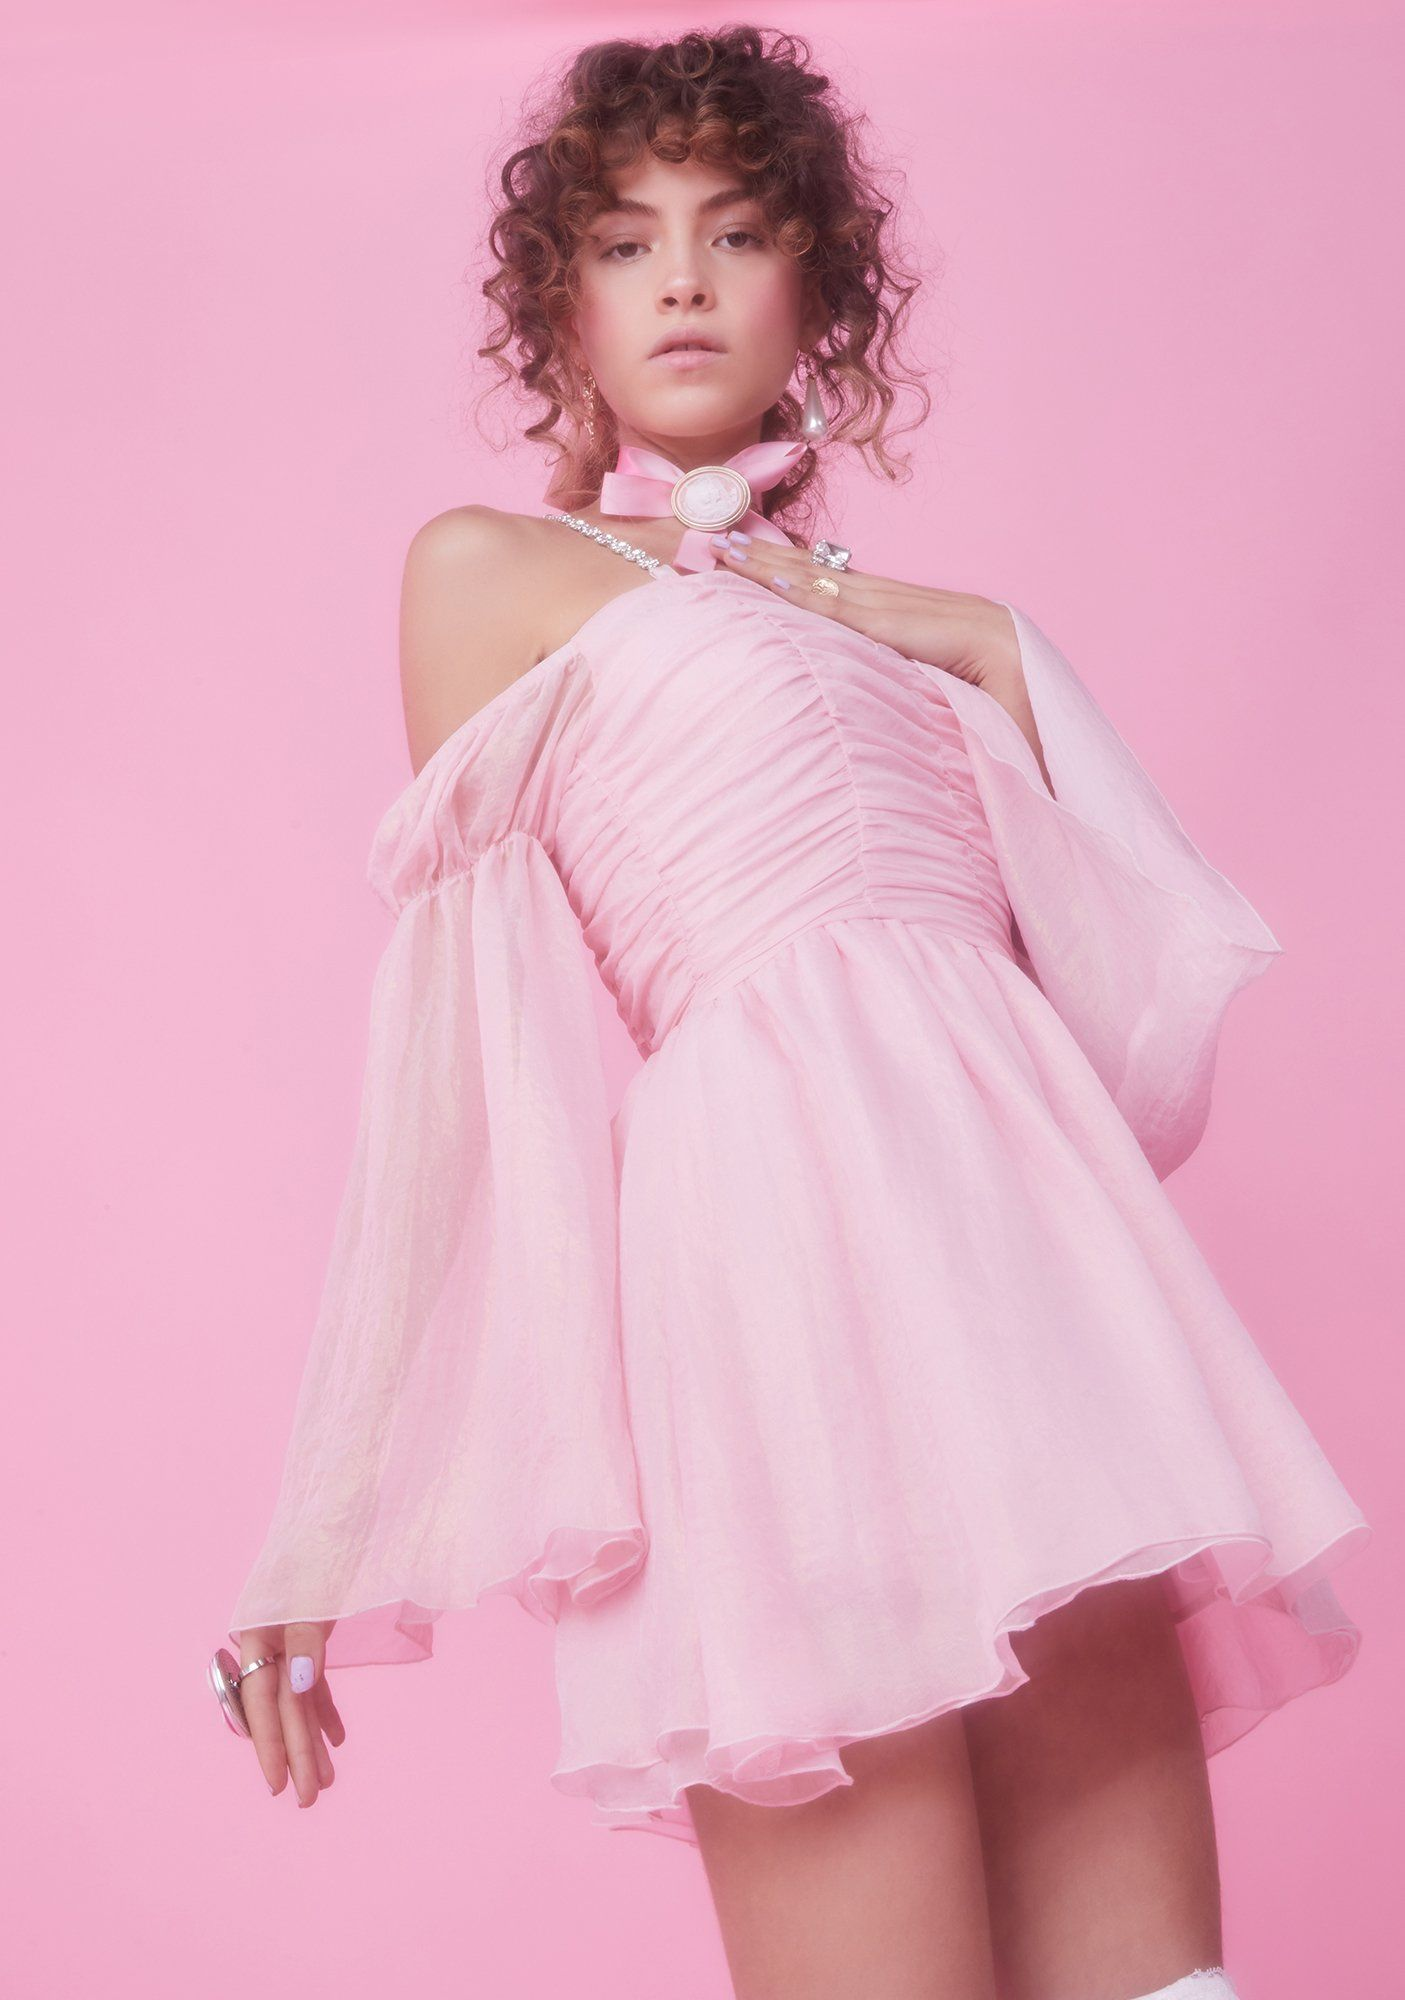 Let Them Eat Me Chiffon Corset Dress Corset Dress Dresses Mini Dress [ 2000 x 1405 Pixel ]